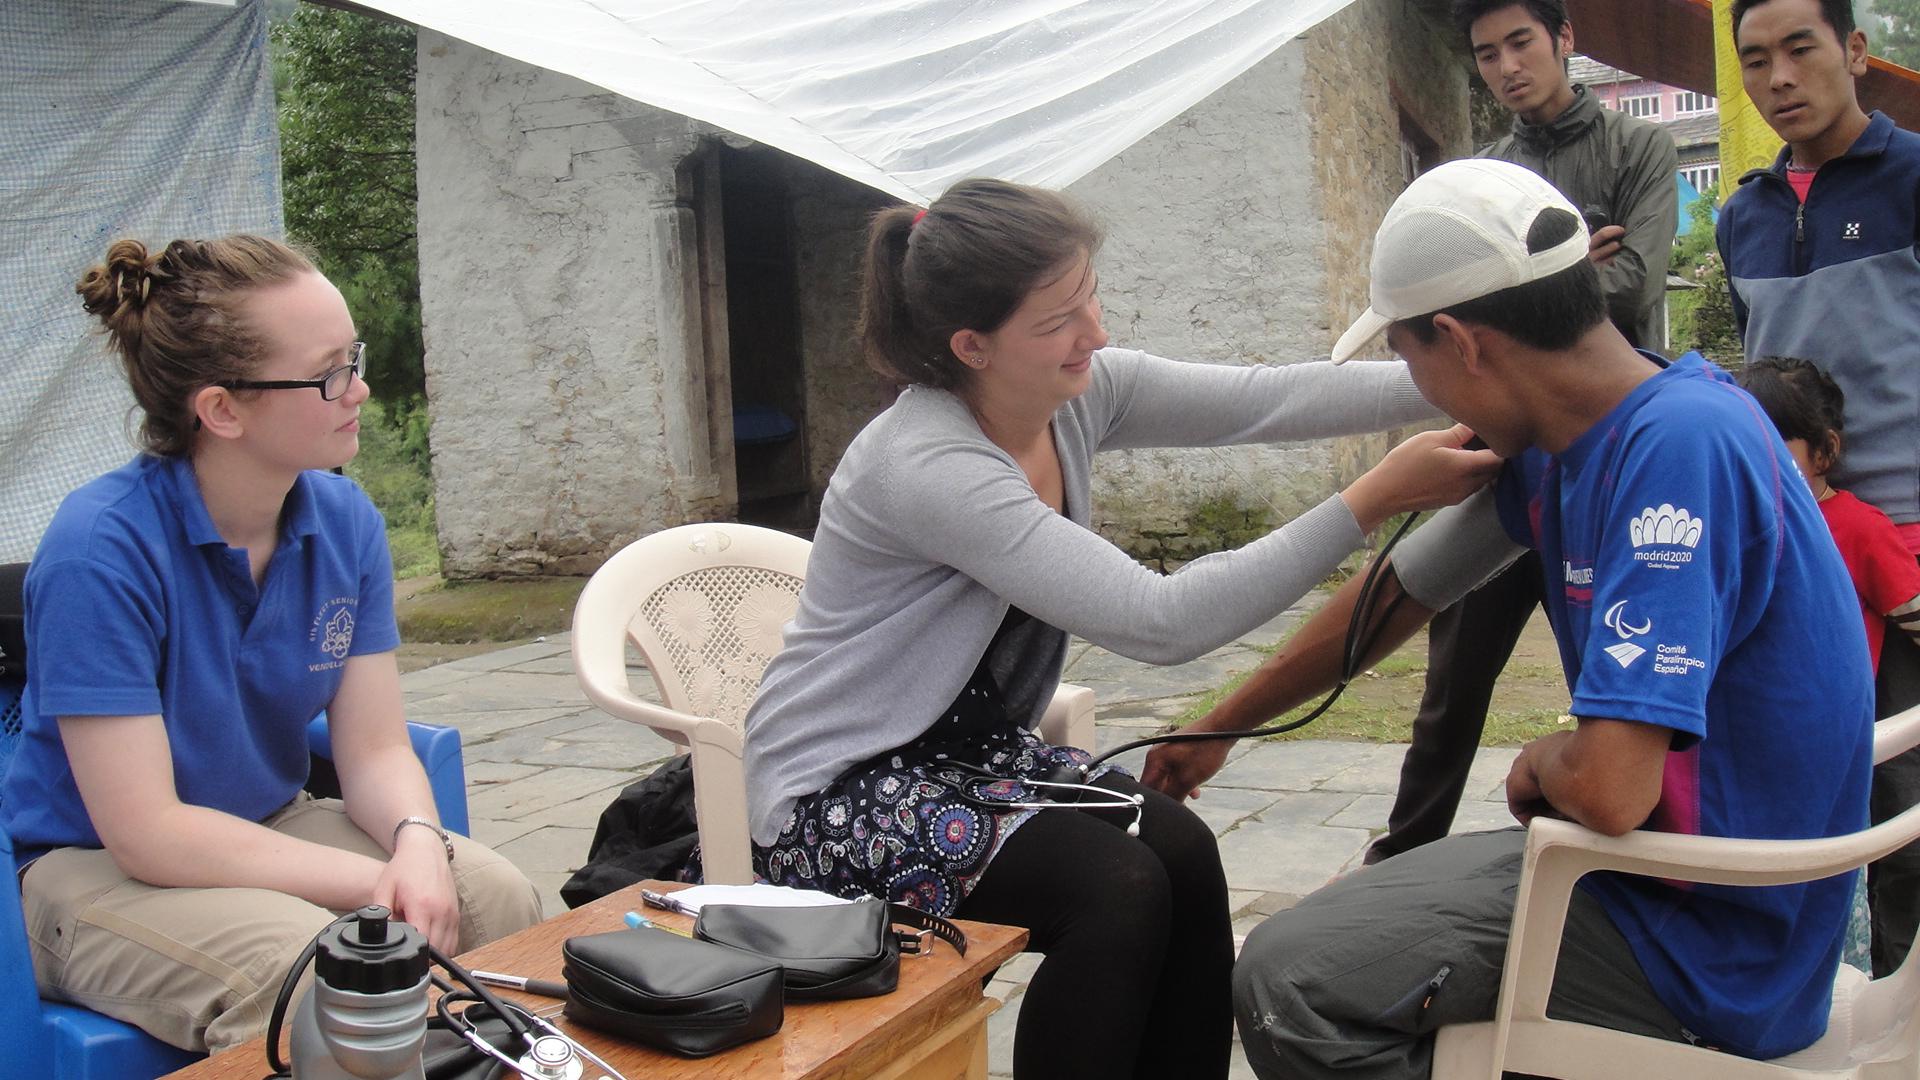 Medical_Students_Working_Adventure_Alternative_Nepal.JPG